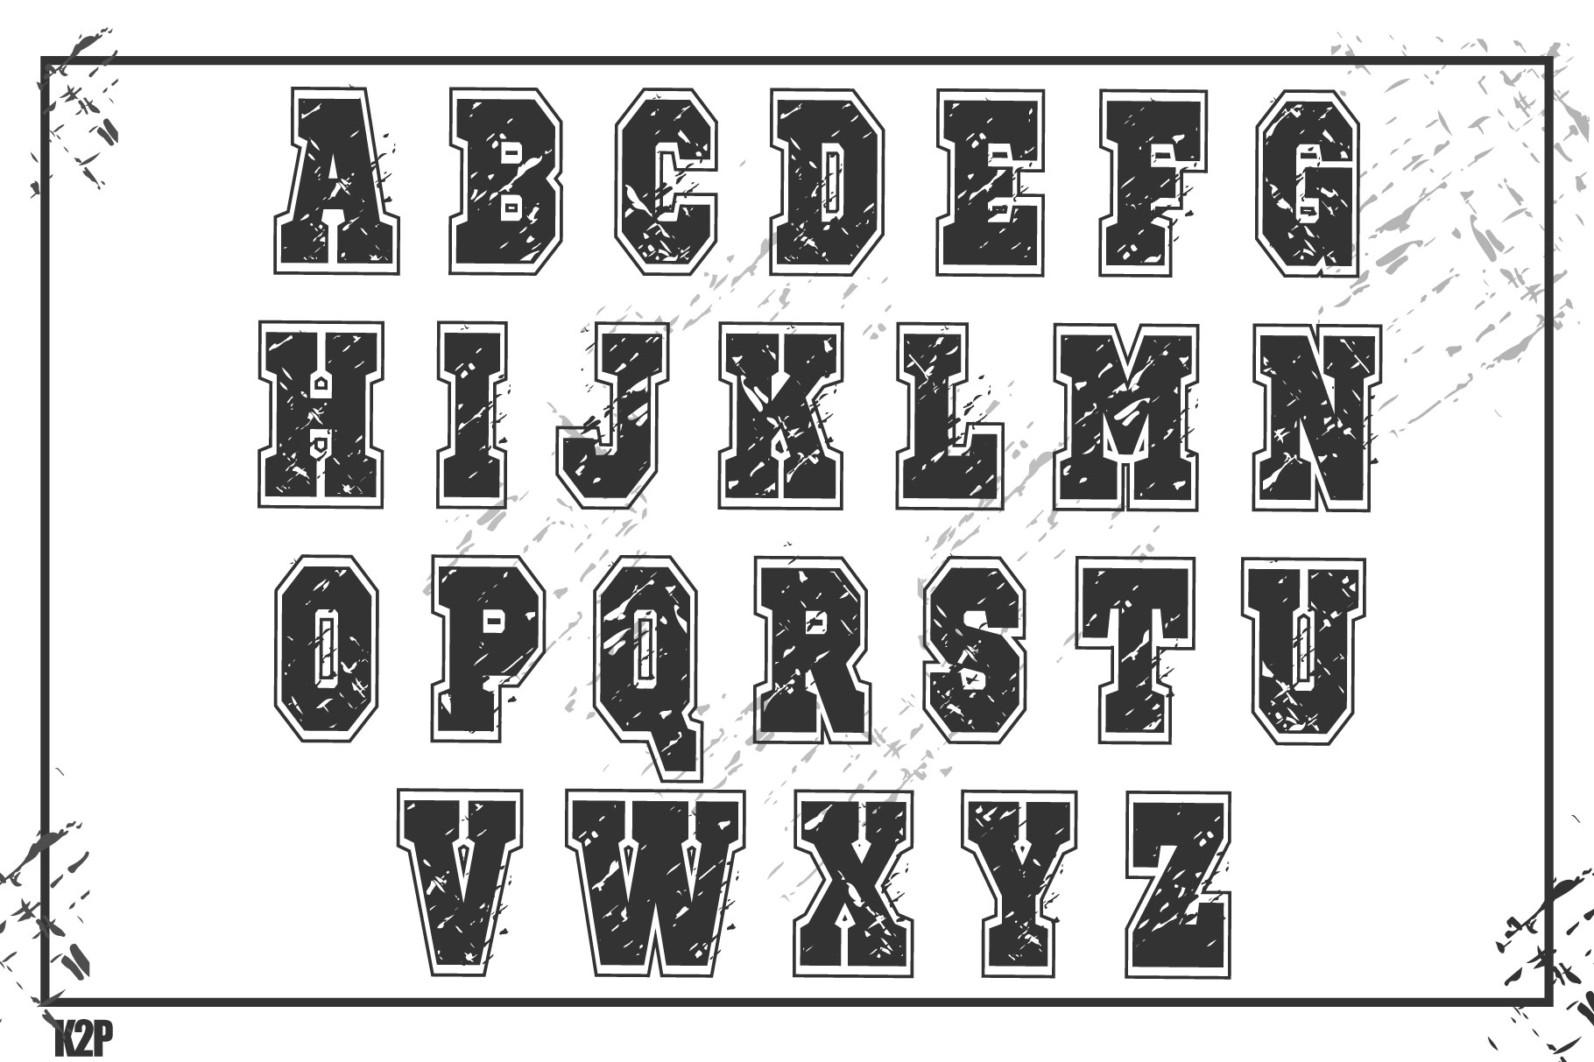 Grunge College 2 layers SVG Cut Files - GRUNGE COLLEGE AD5 -